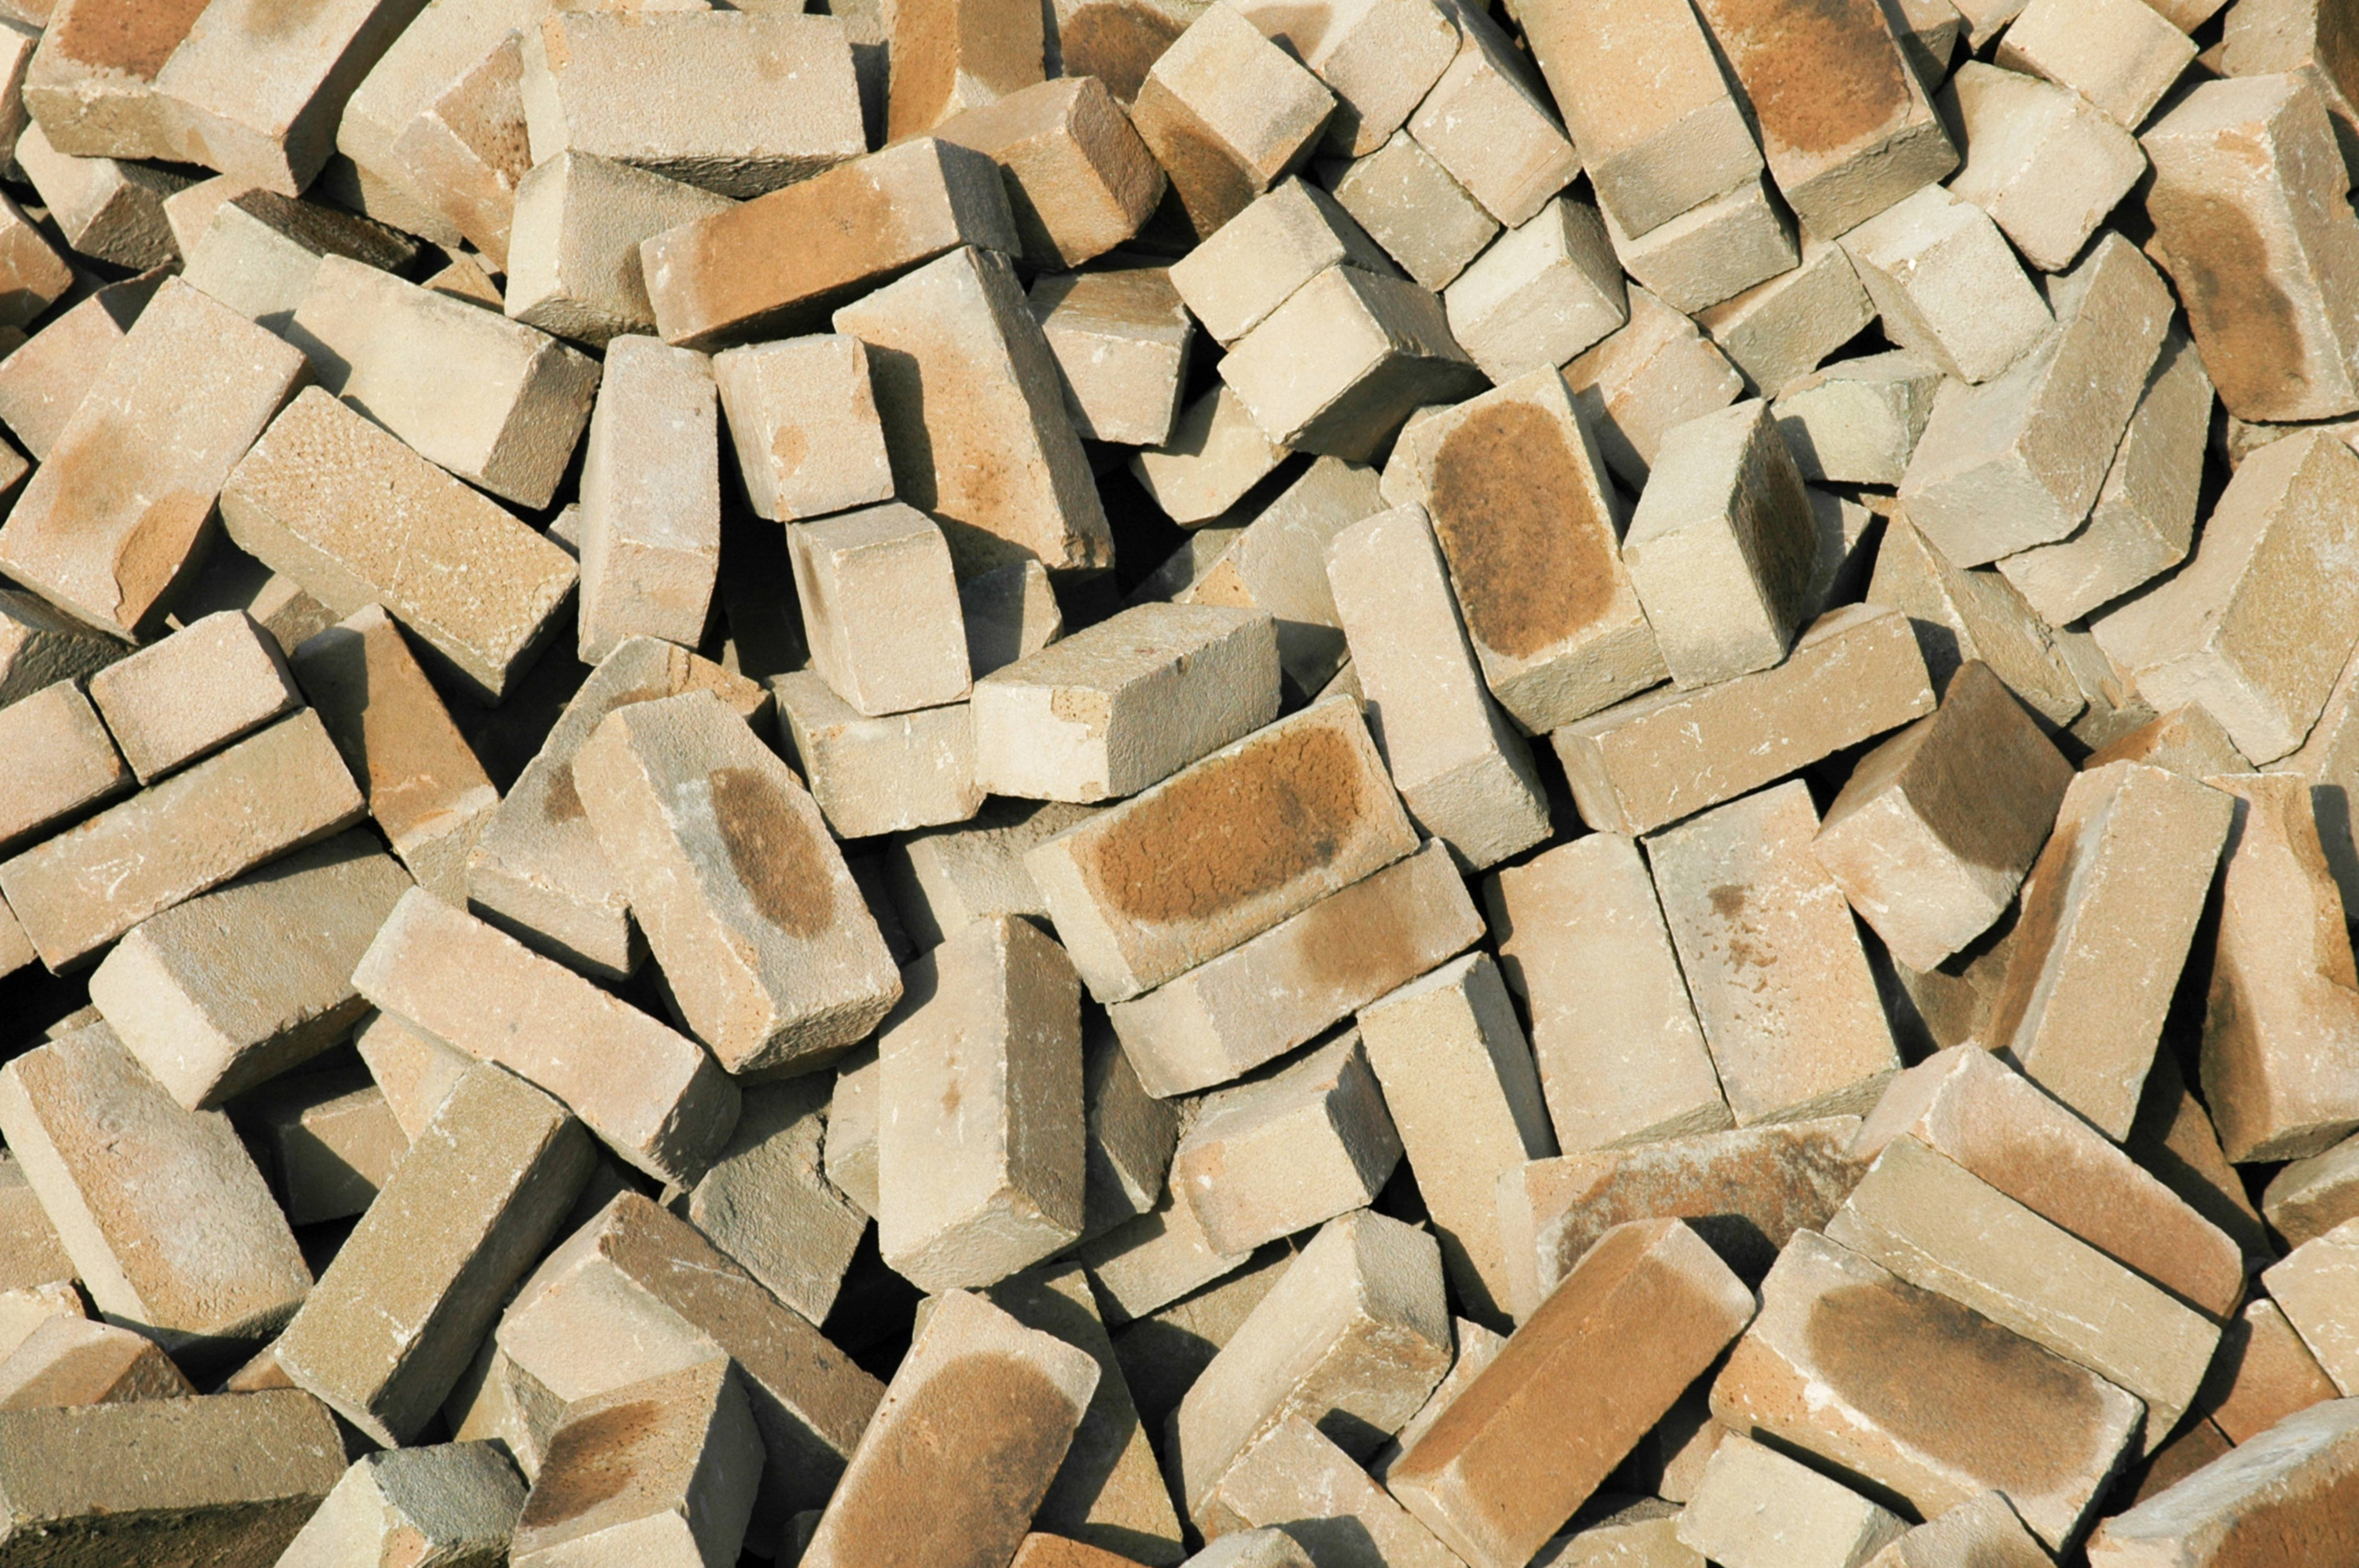 Pile of Bricks background pattern